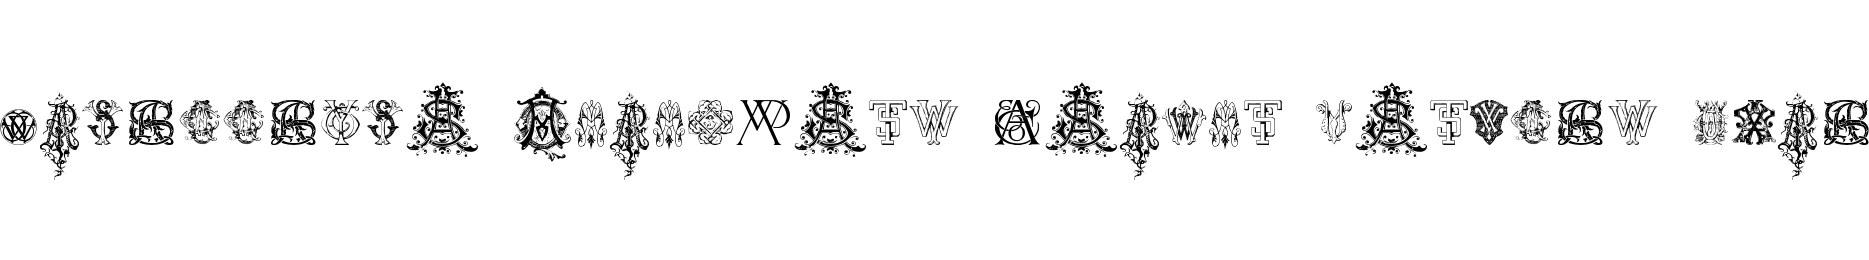 Intellecta Monograms Random Samples Nine